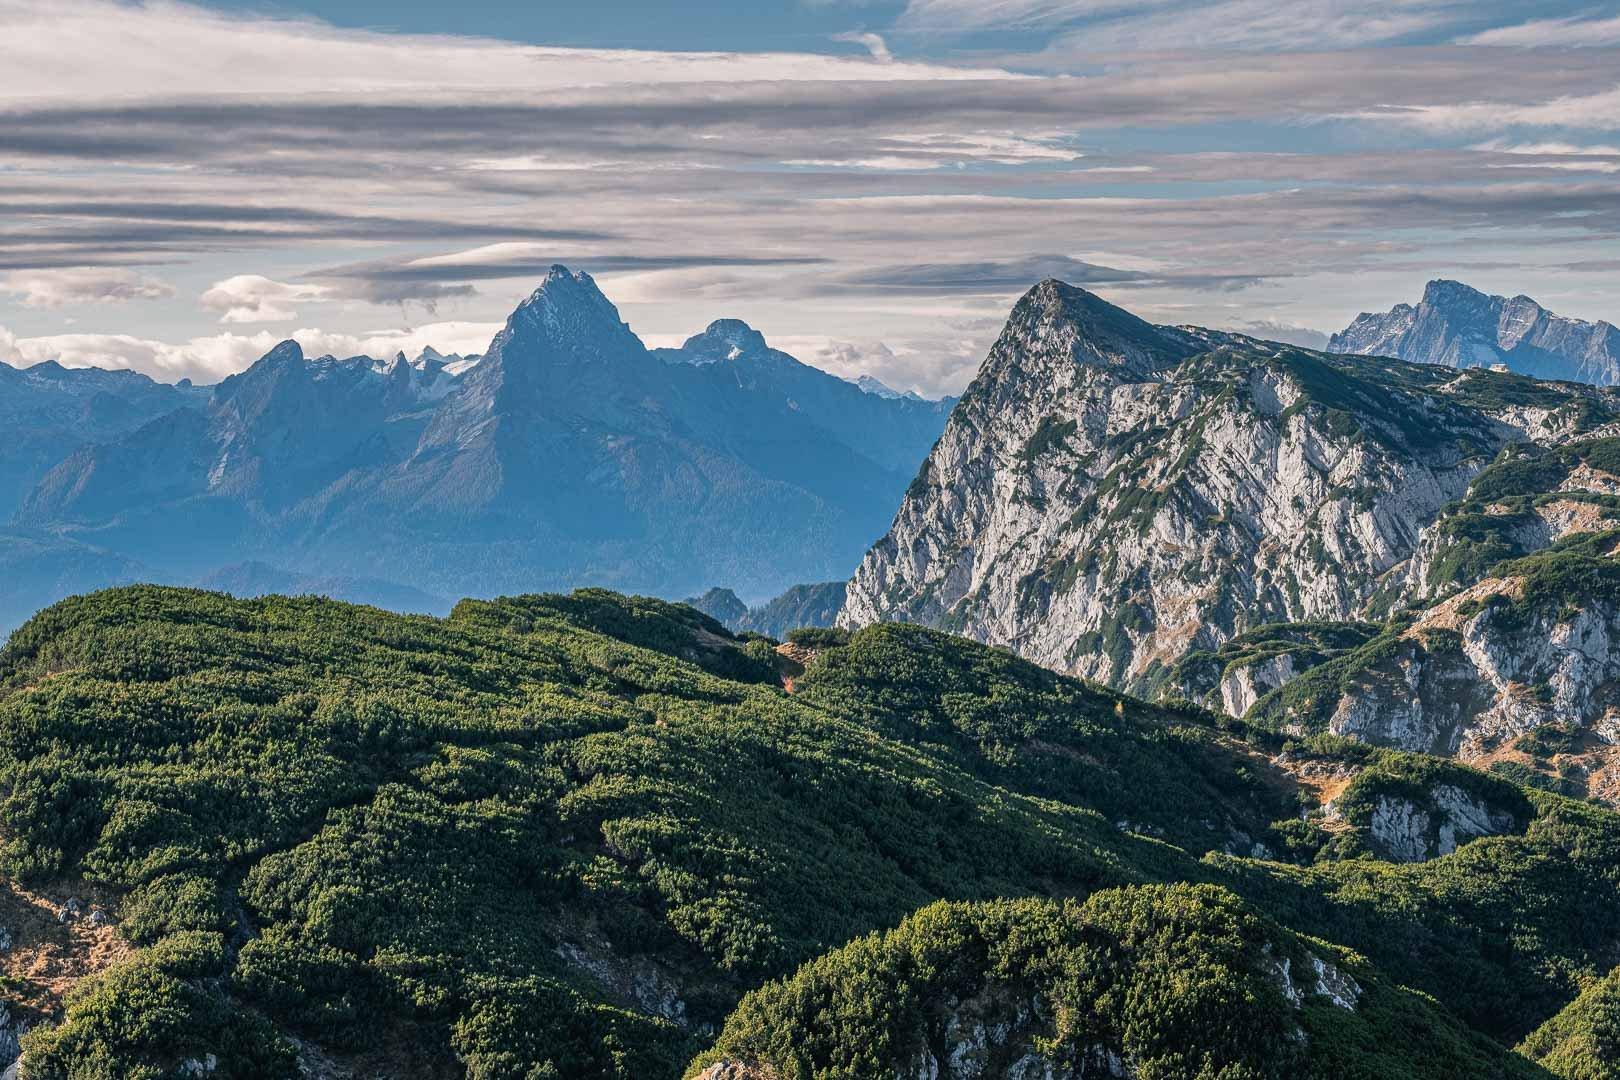 Watzmann seen from the top of Untersberg mountain